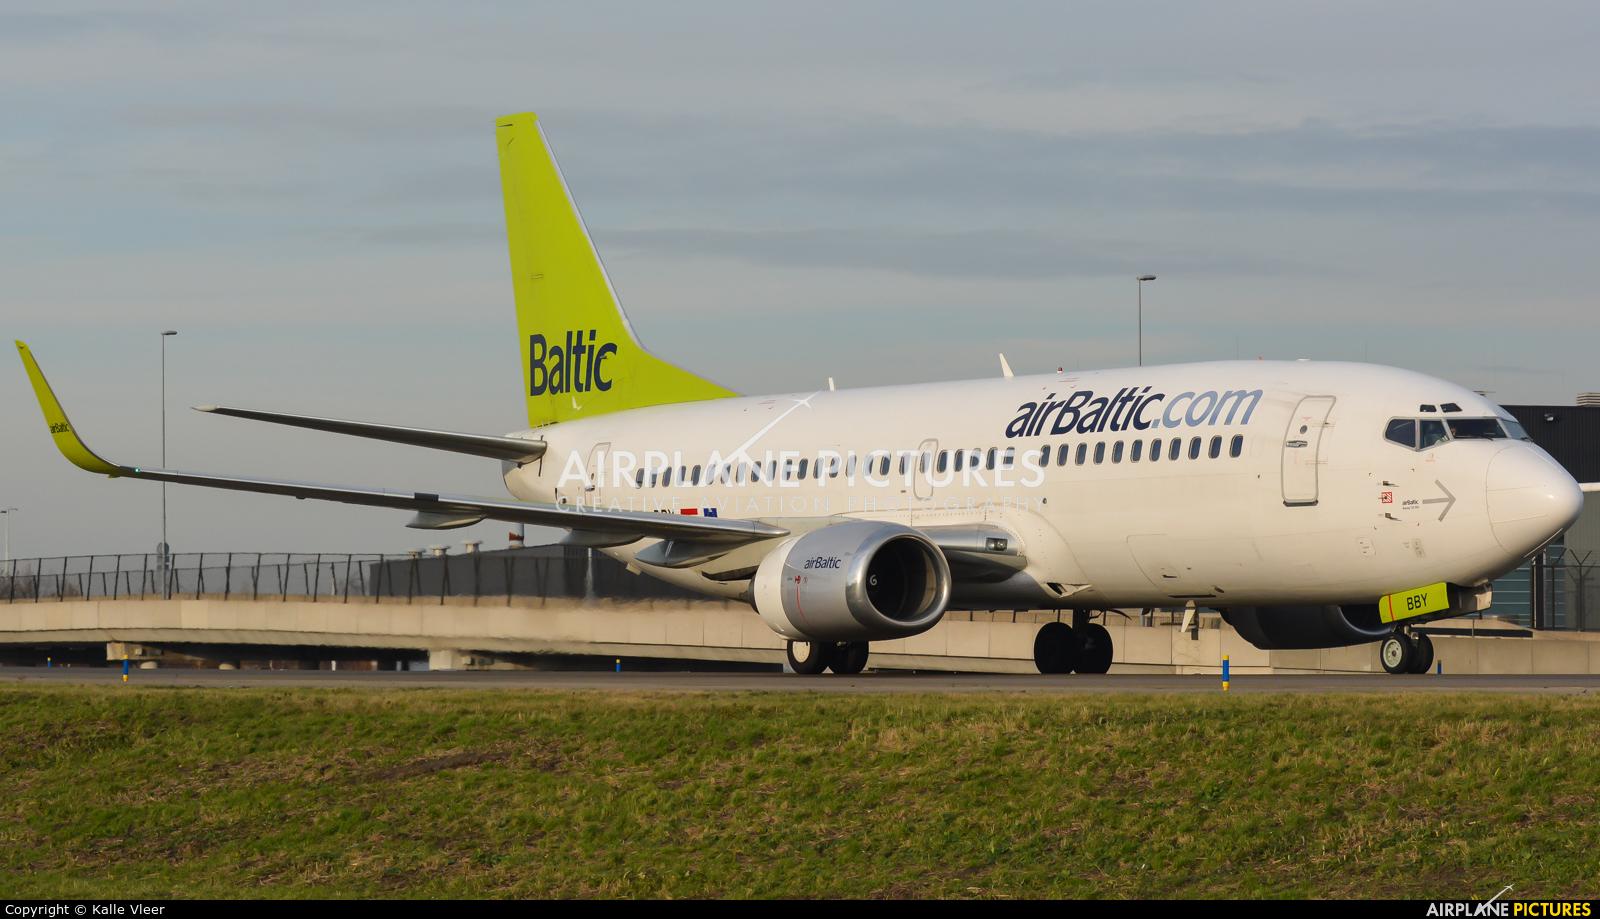 Air Baltic YL-BBY aircraft at Amsterdam - Schiphol